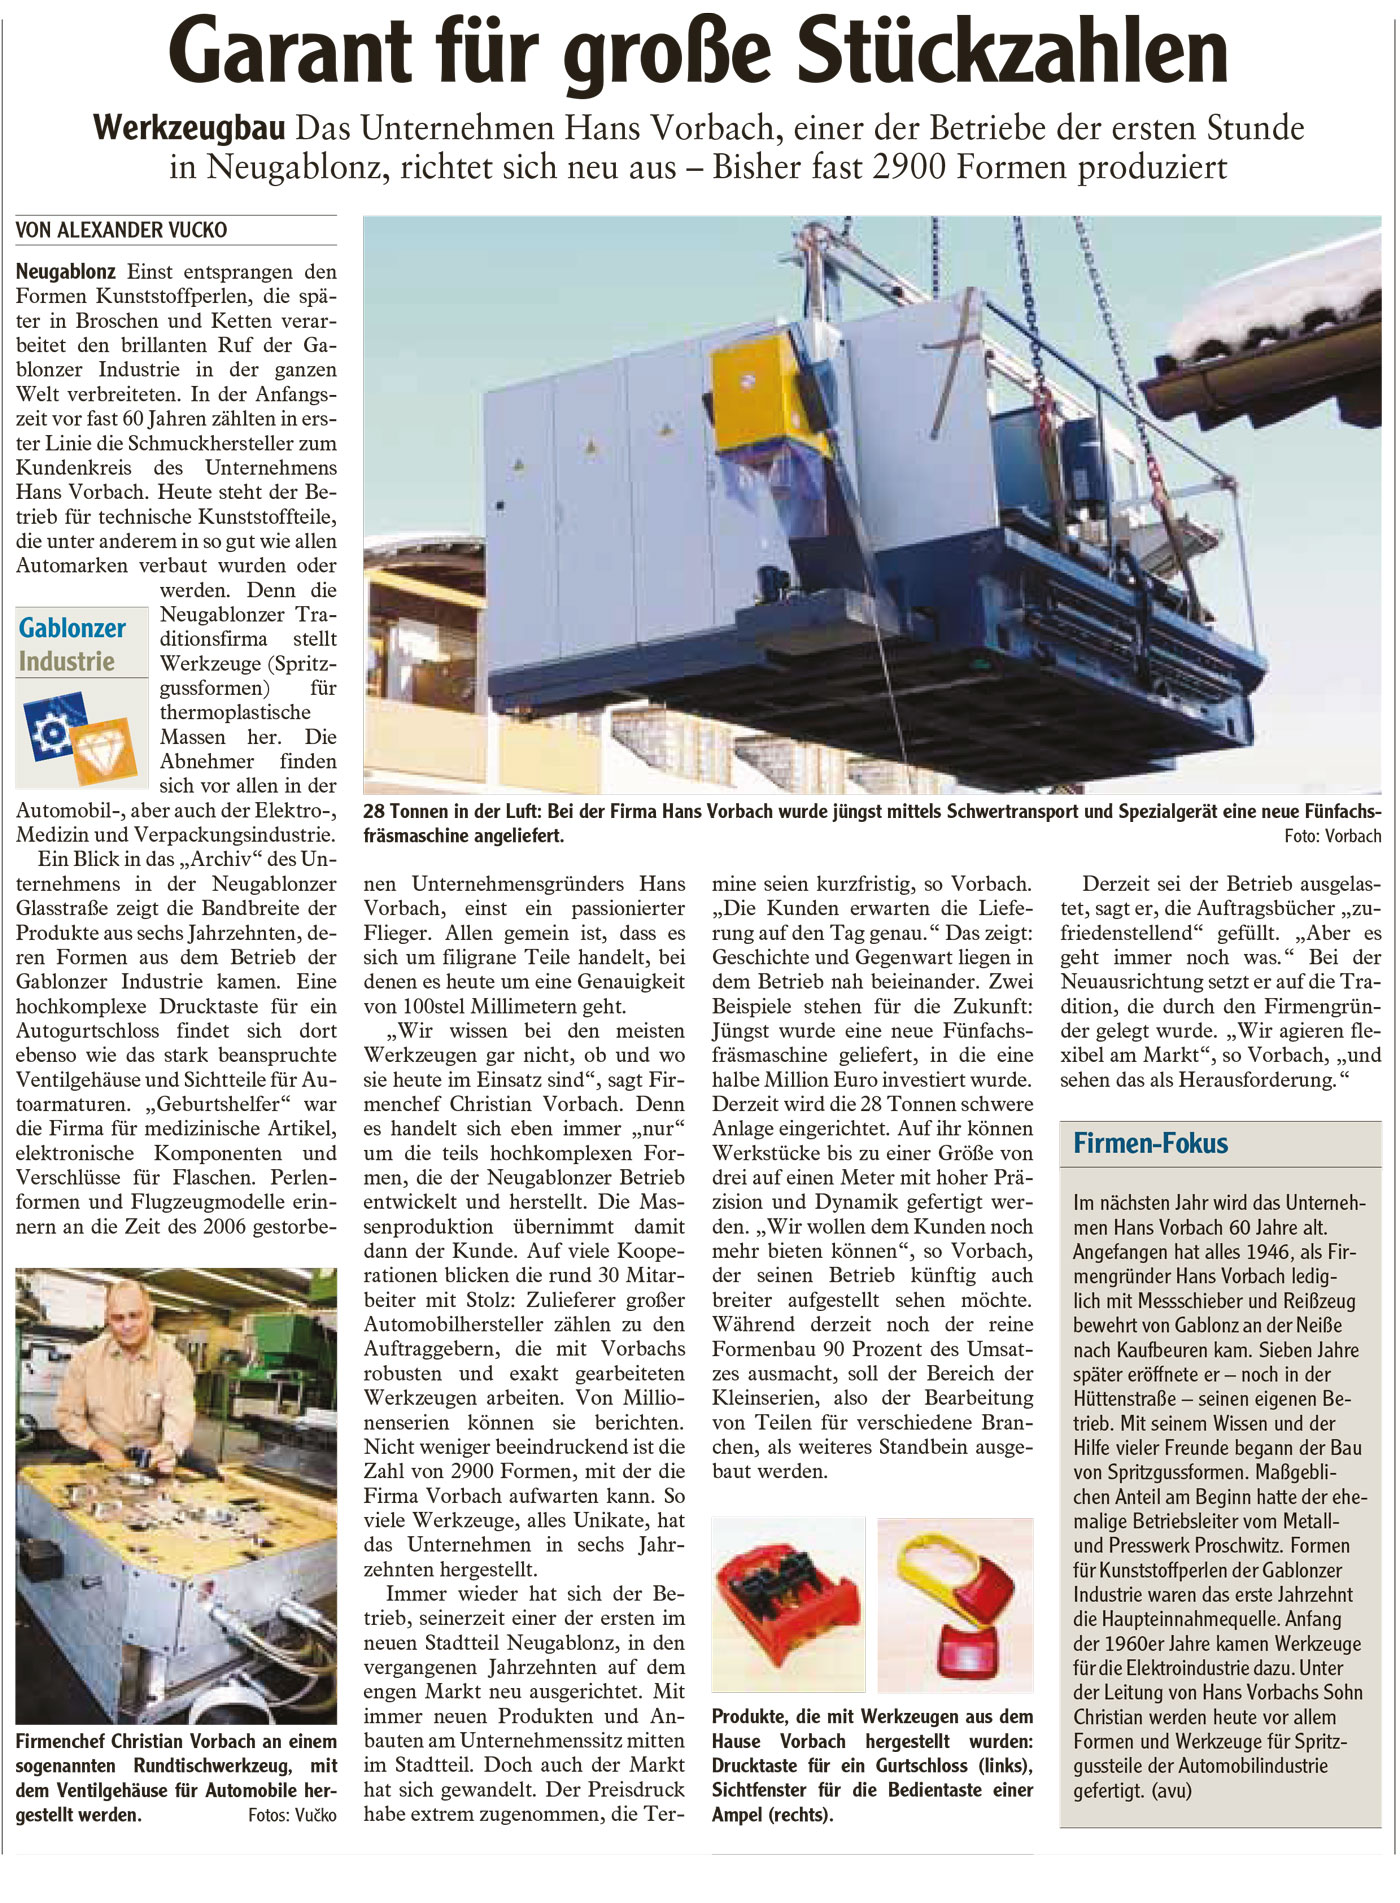 Pressebericht über Firma Vorbach Formenbau GmbH